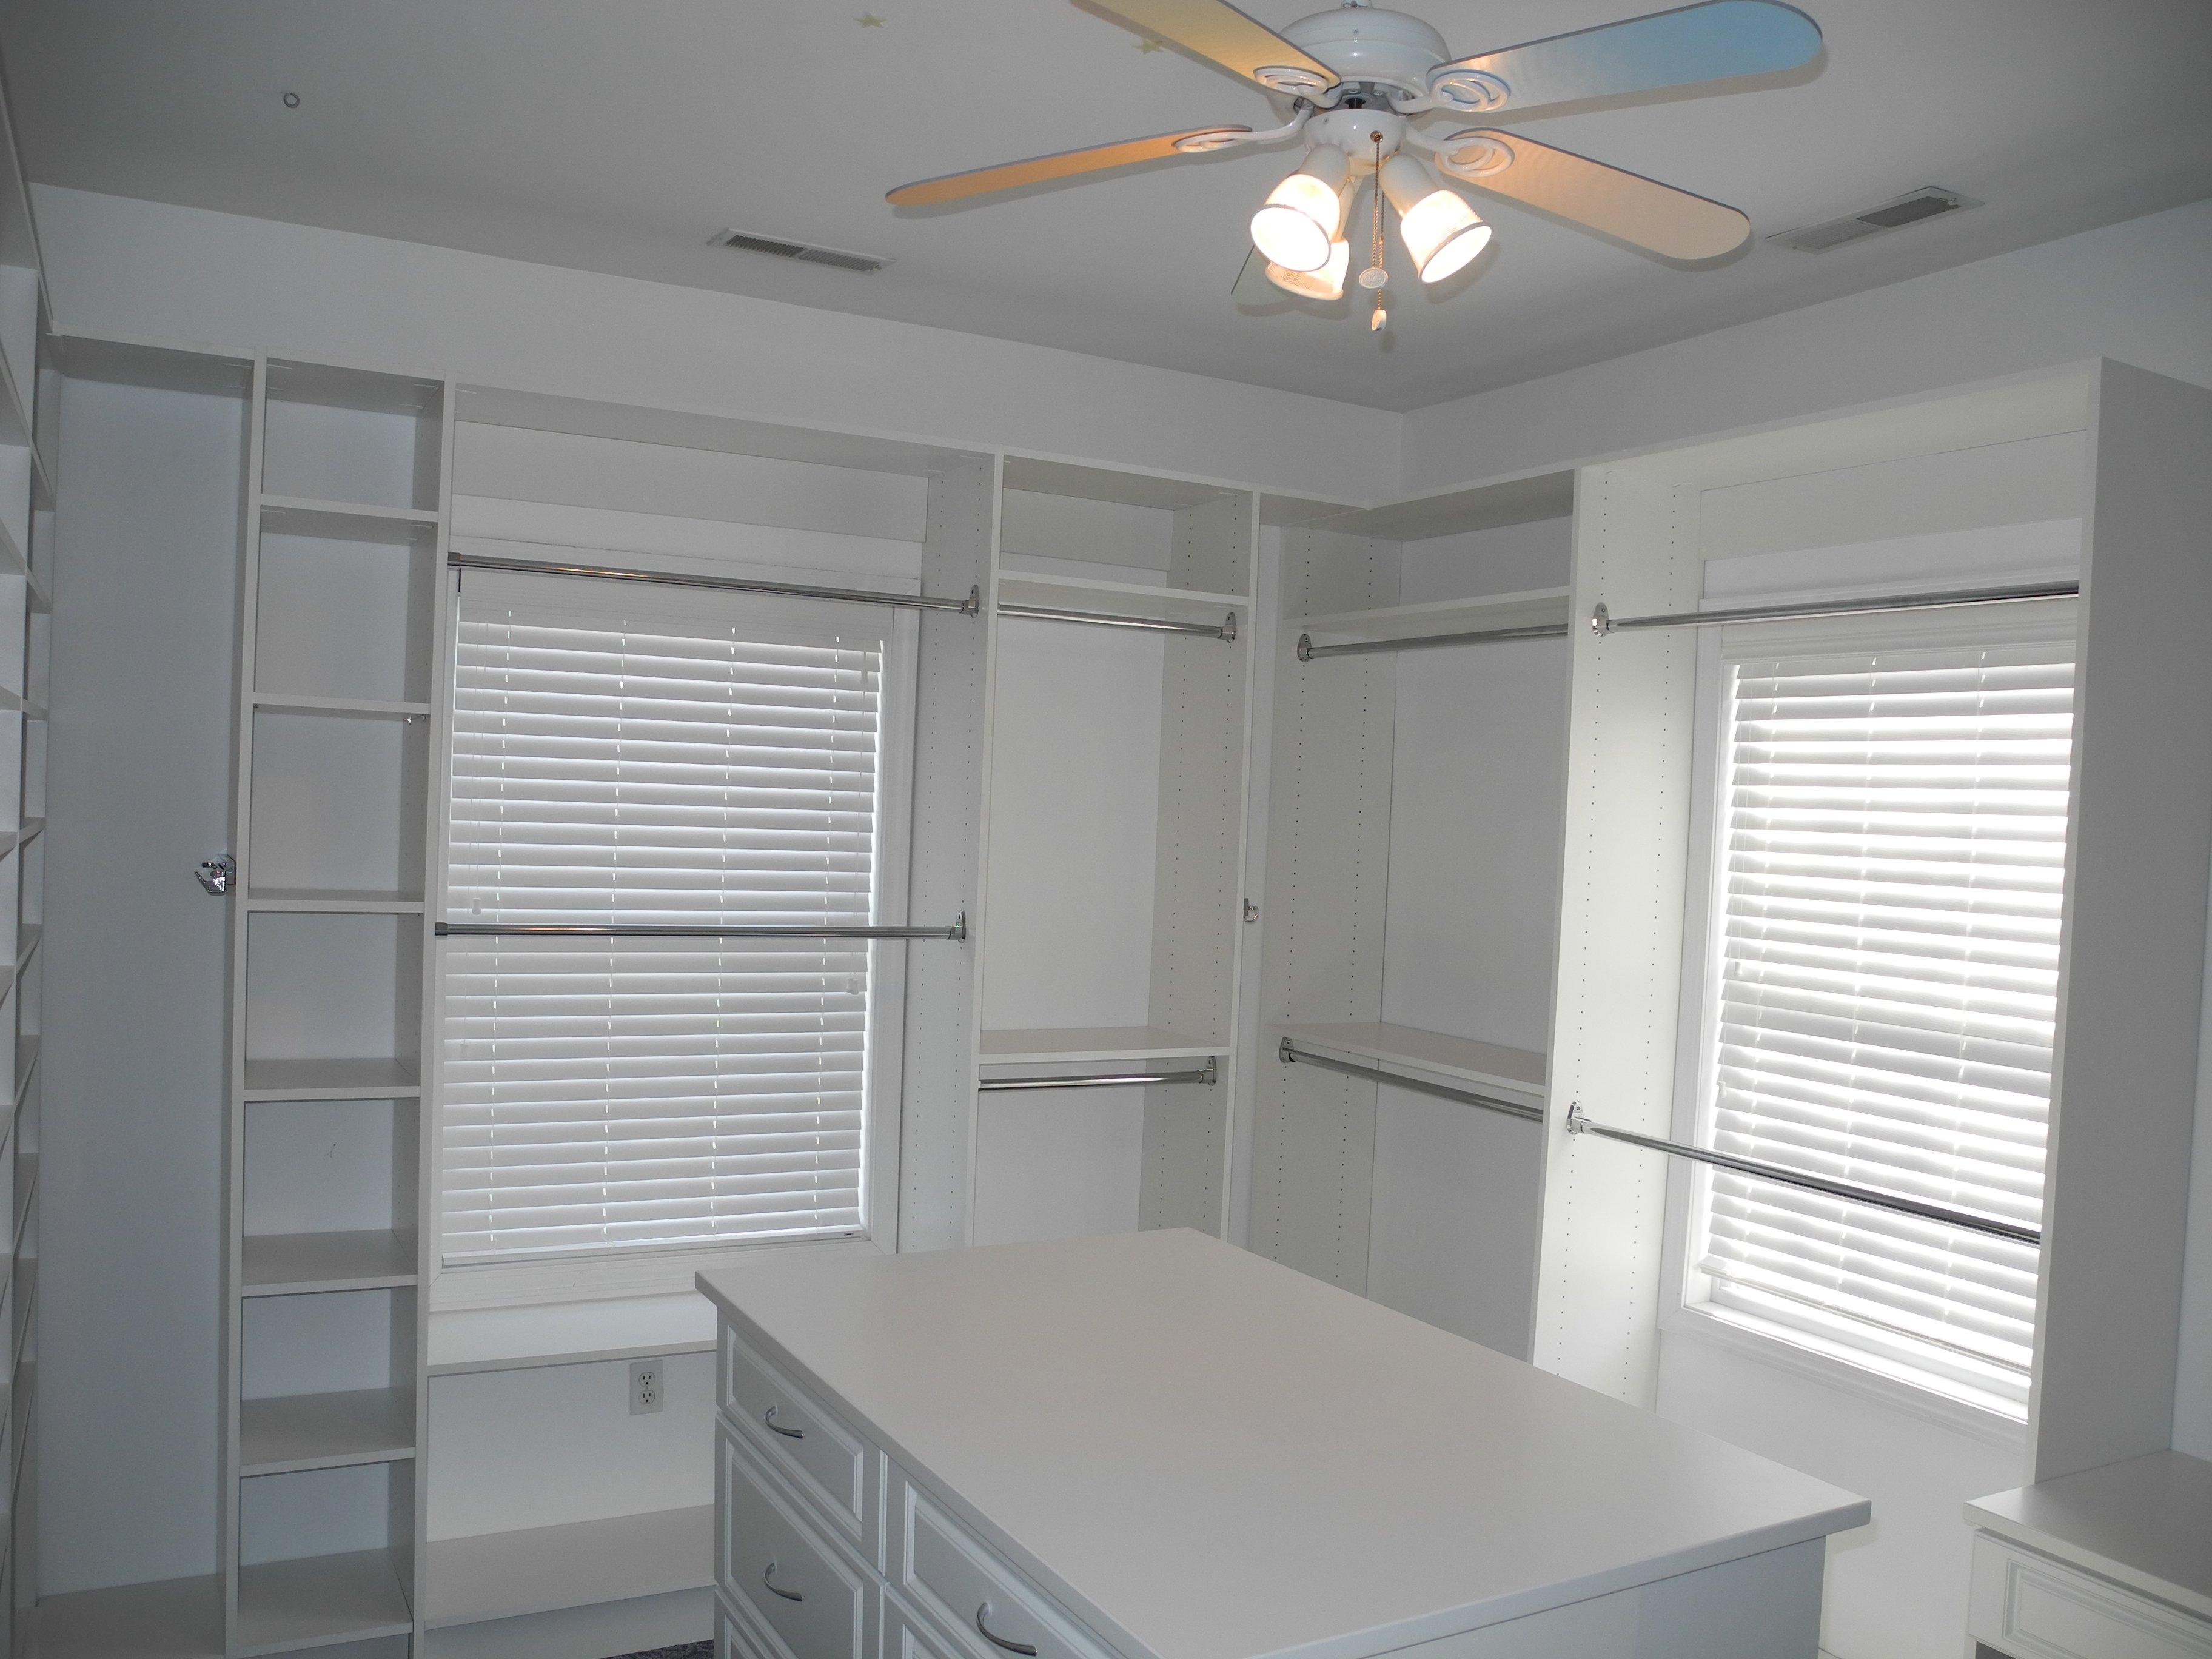 Bedroom Converted Into Walk In Closet